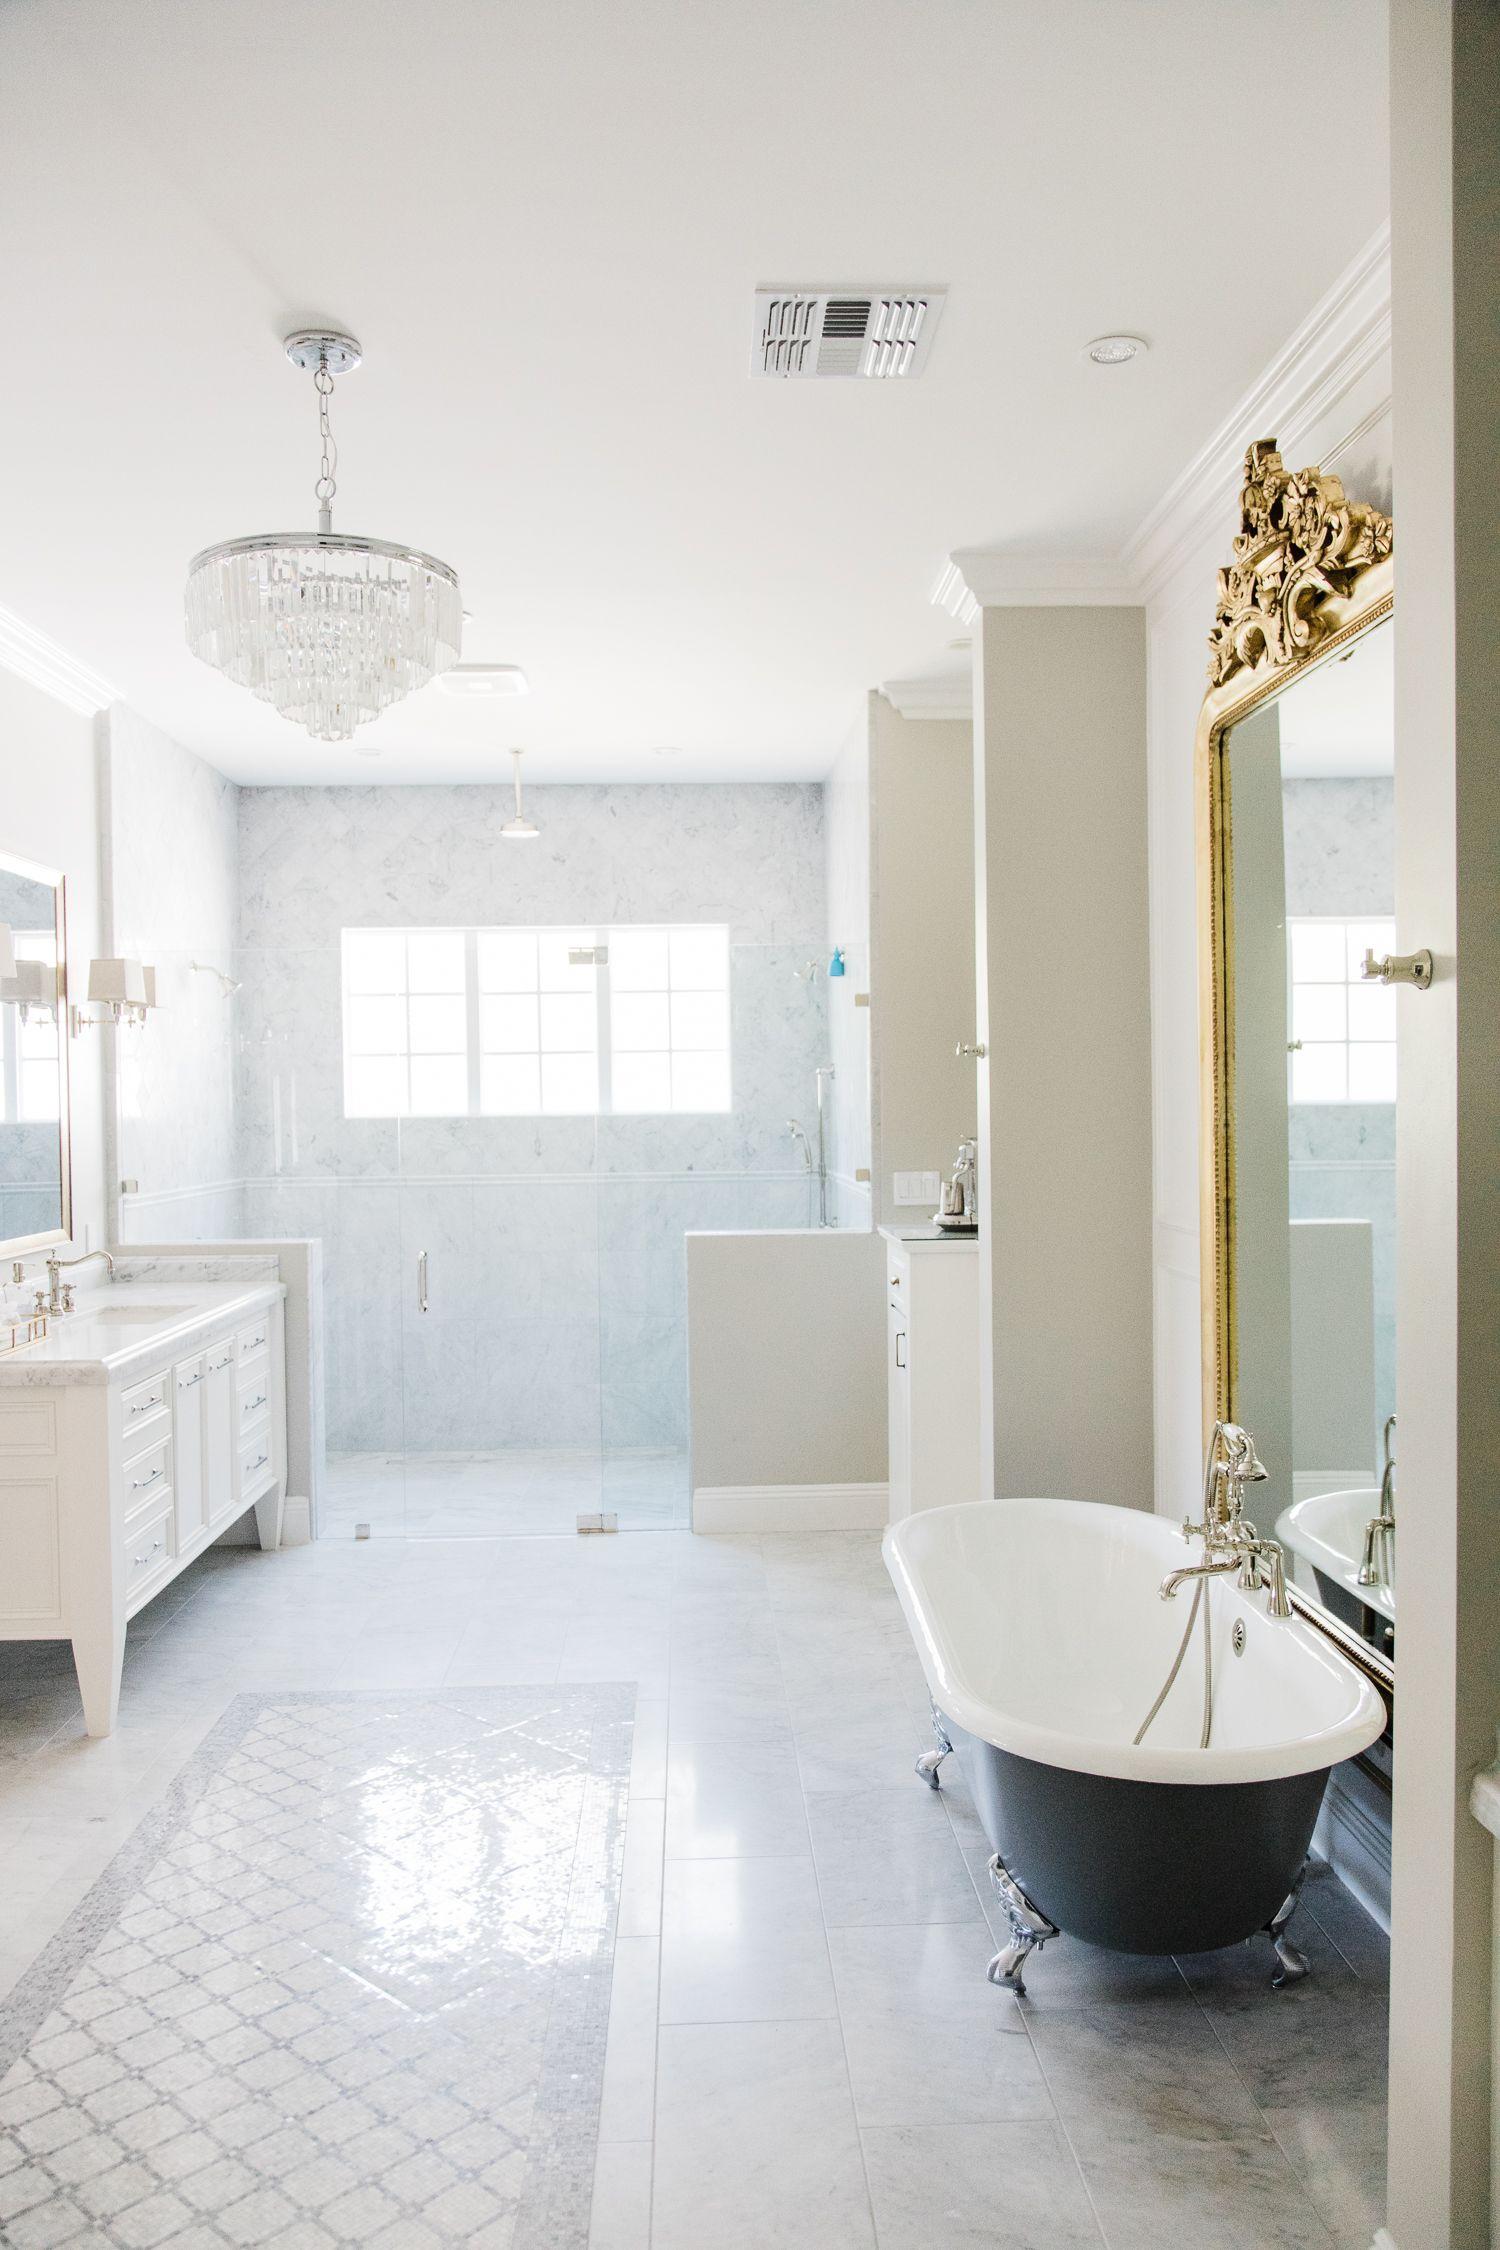 Bathroom Designed Extraordinary Custom Master Bathroom Designed And Builtrafterhouselocated Design Decoration